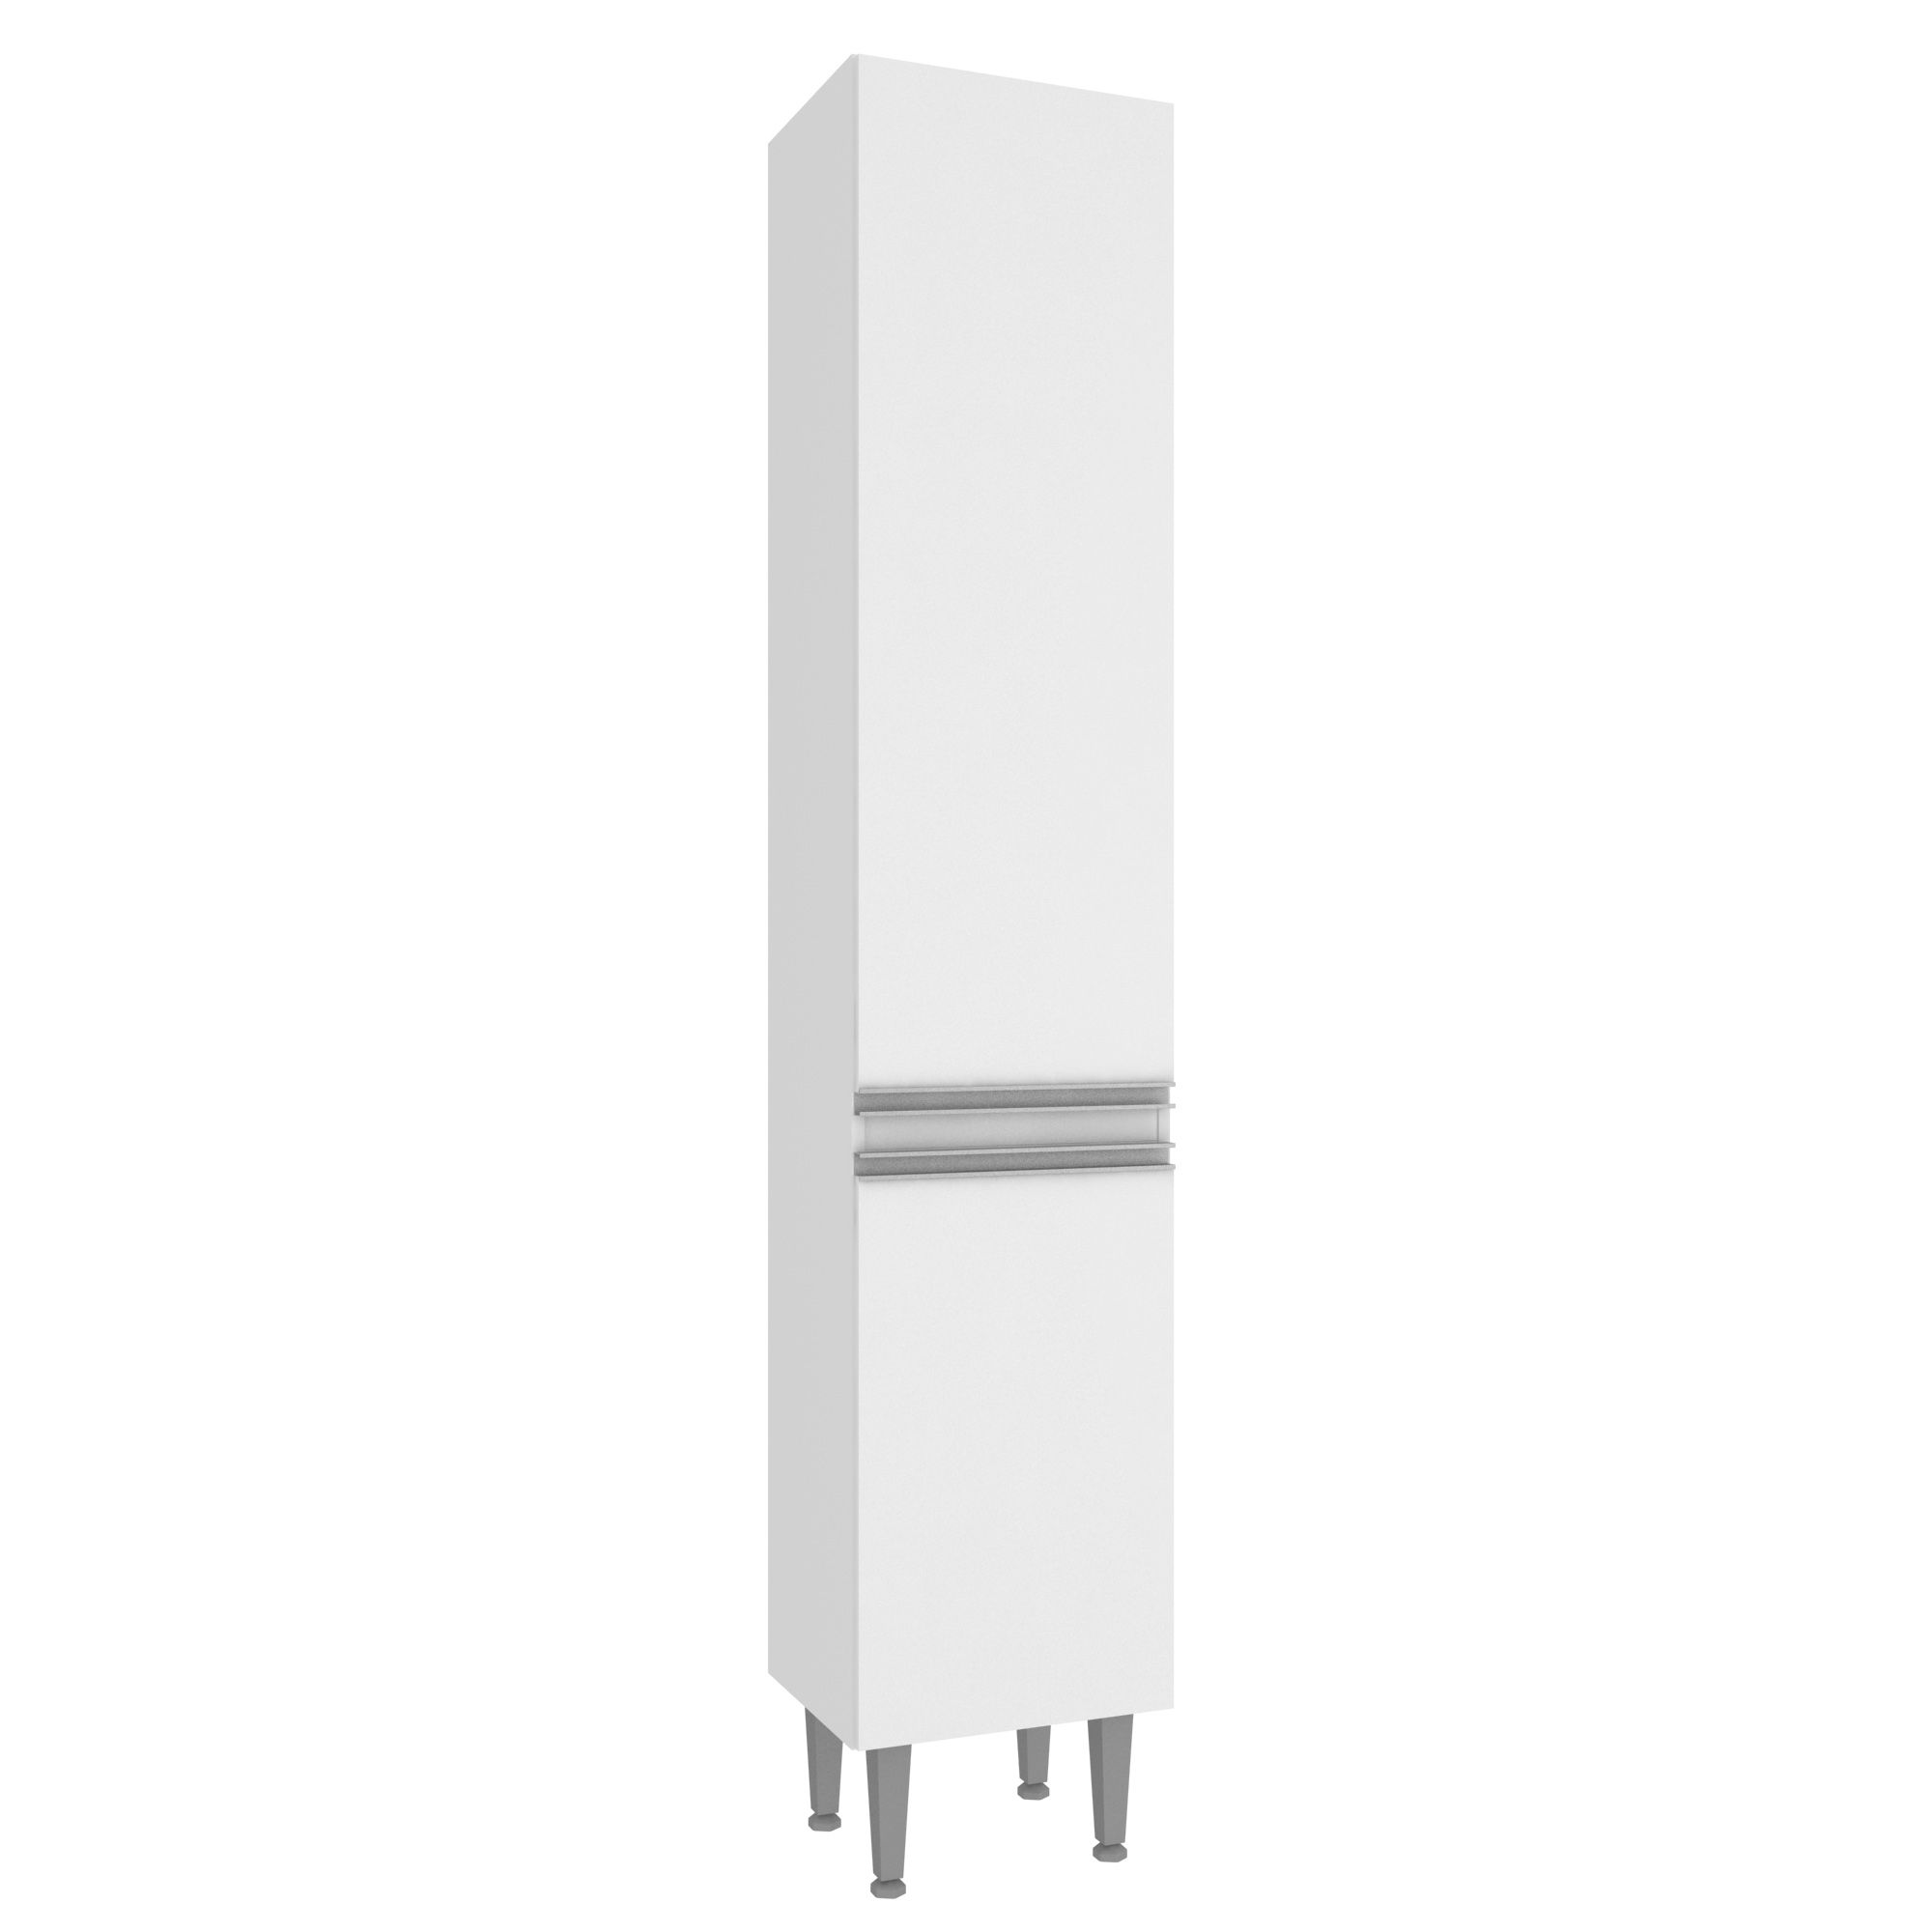 Paneleiro Simples Branco Aretha 2 Portas 3 prateleiras - MegaSul